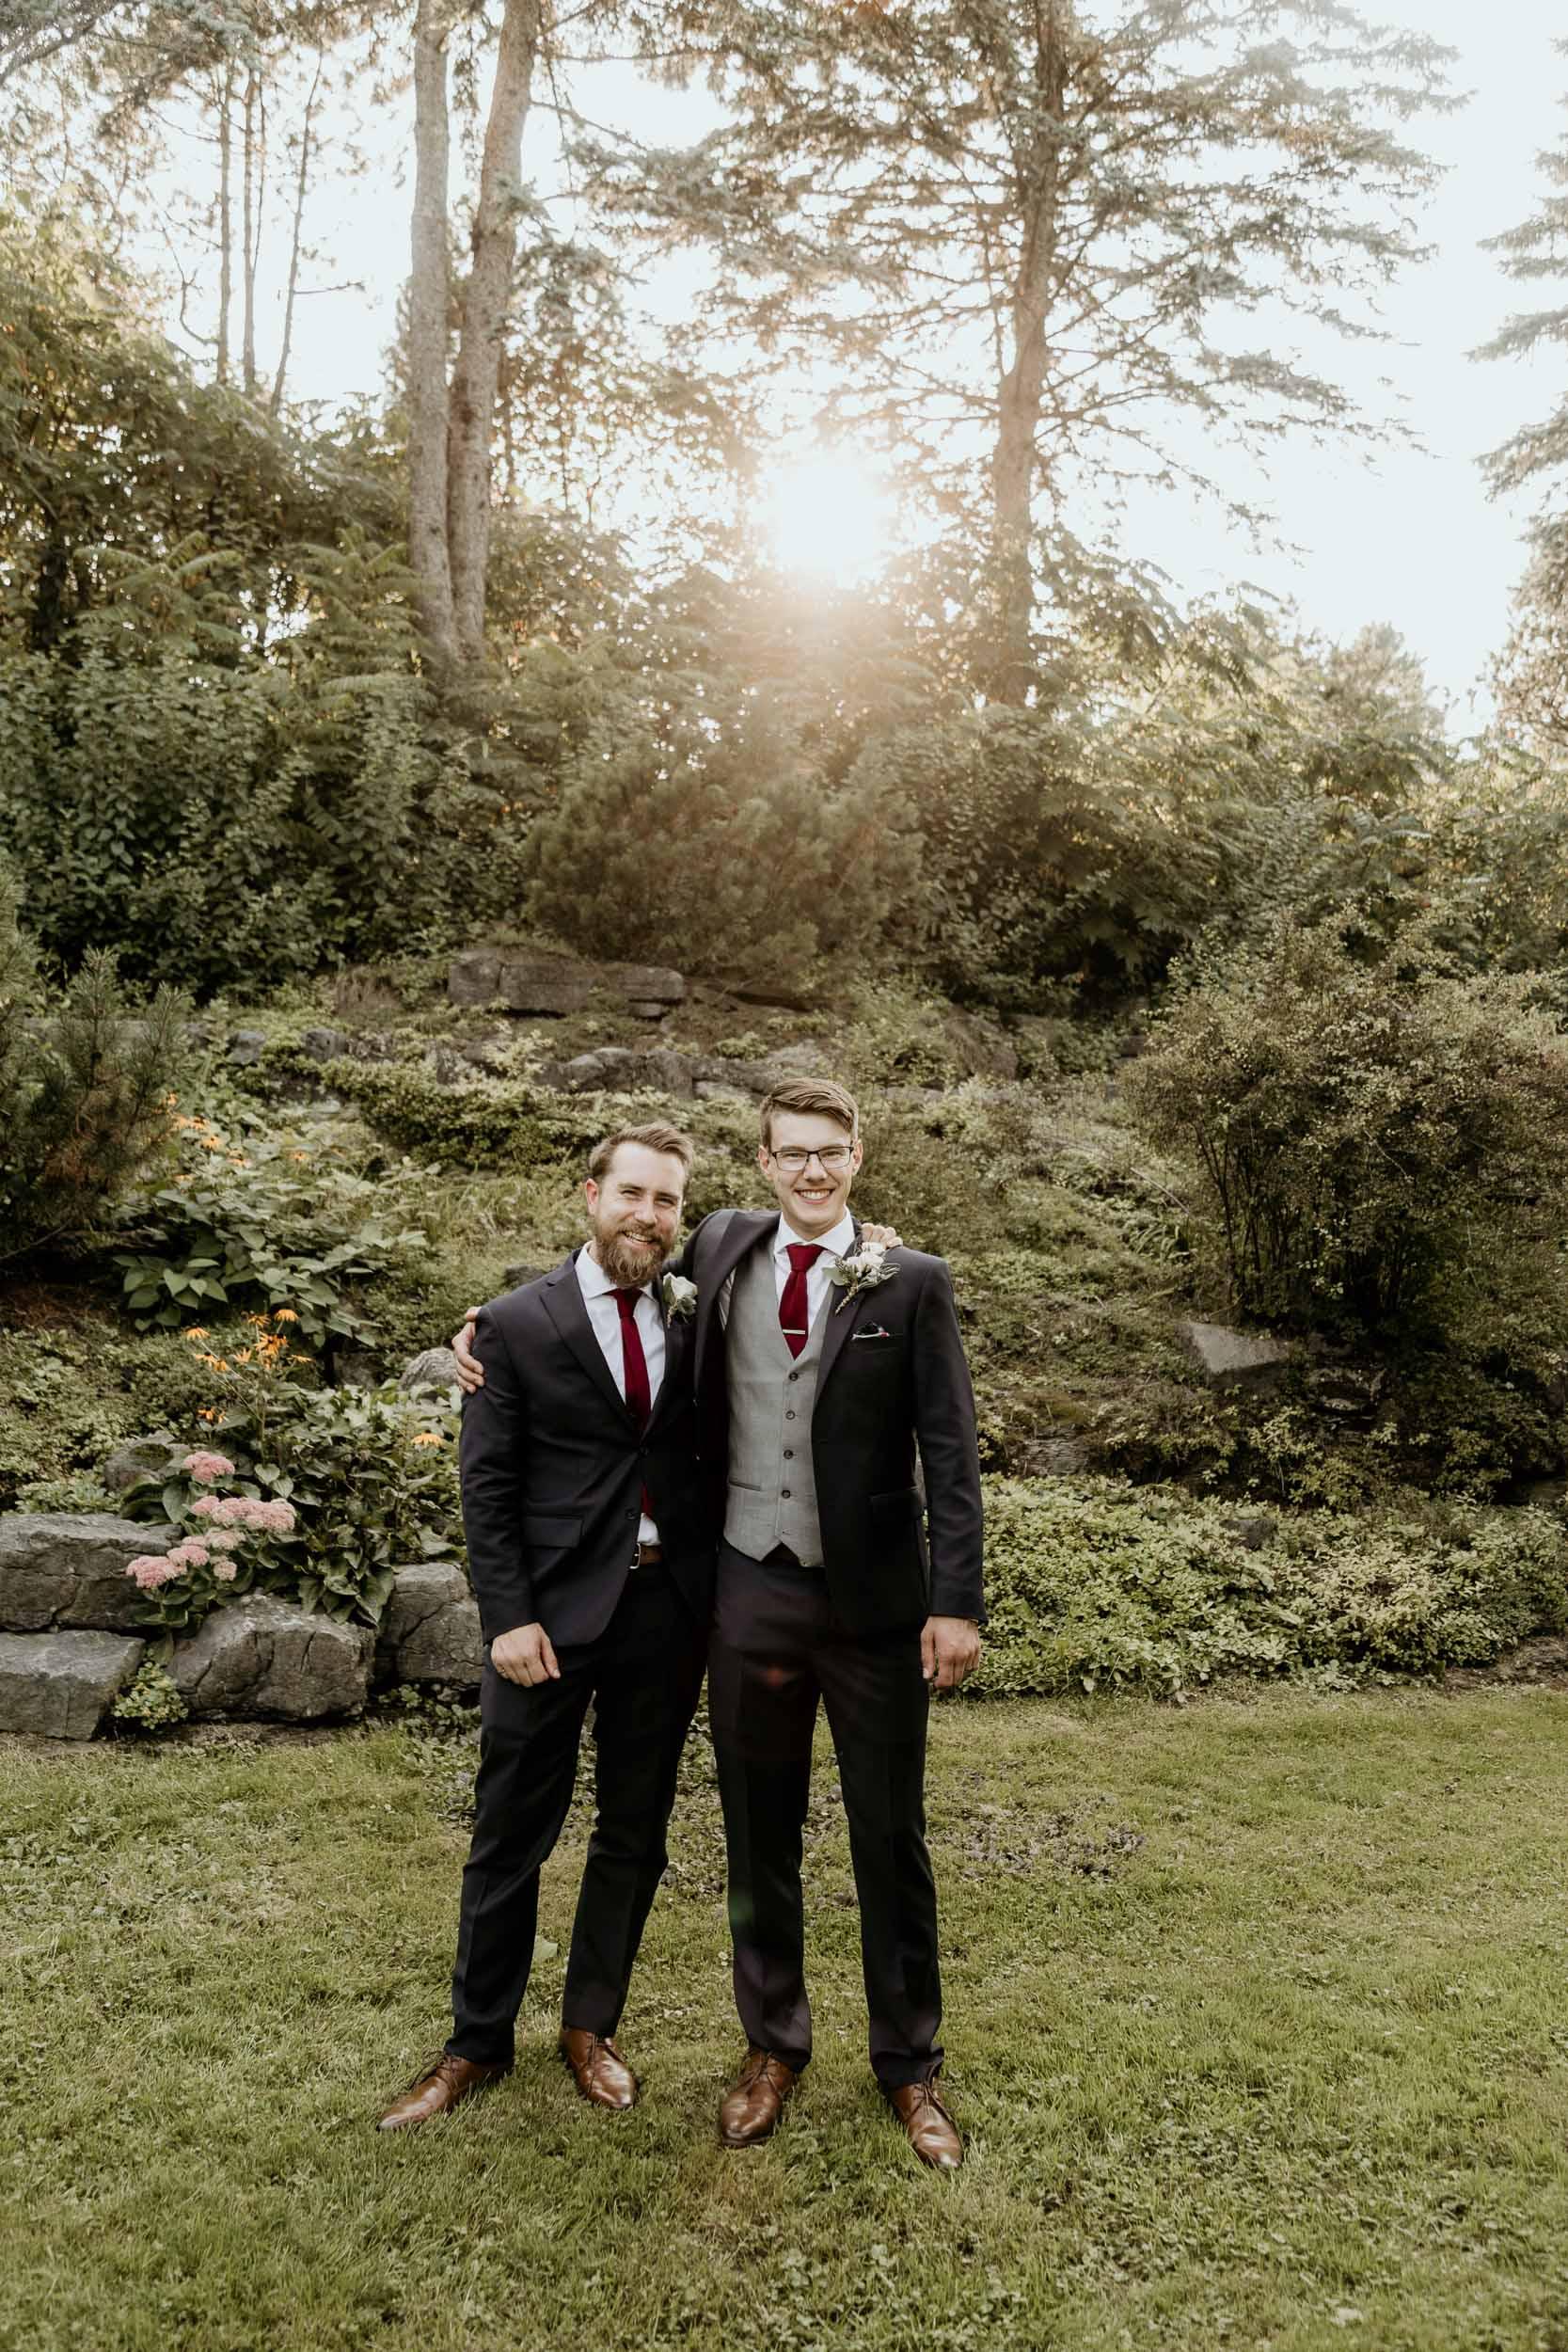 intimate-wedding-elopement-photographer-ottawa-toronto-7588.jpg